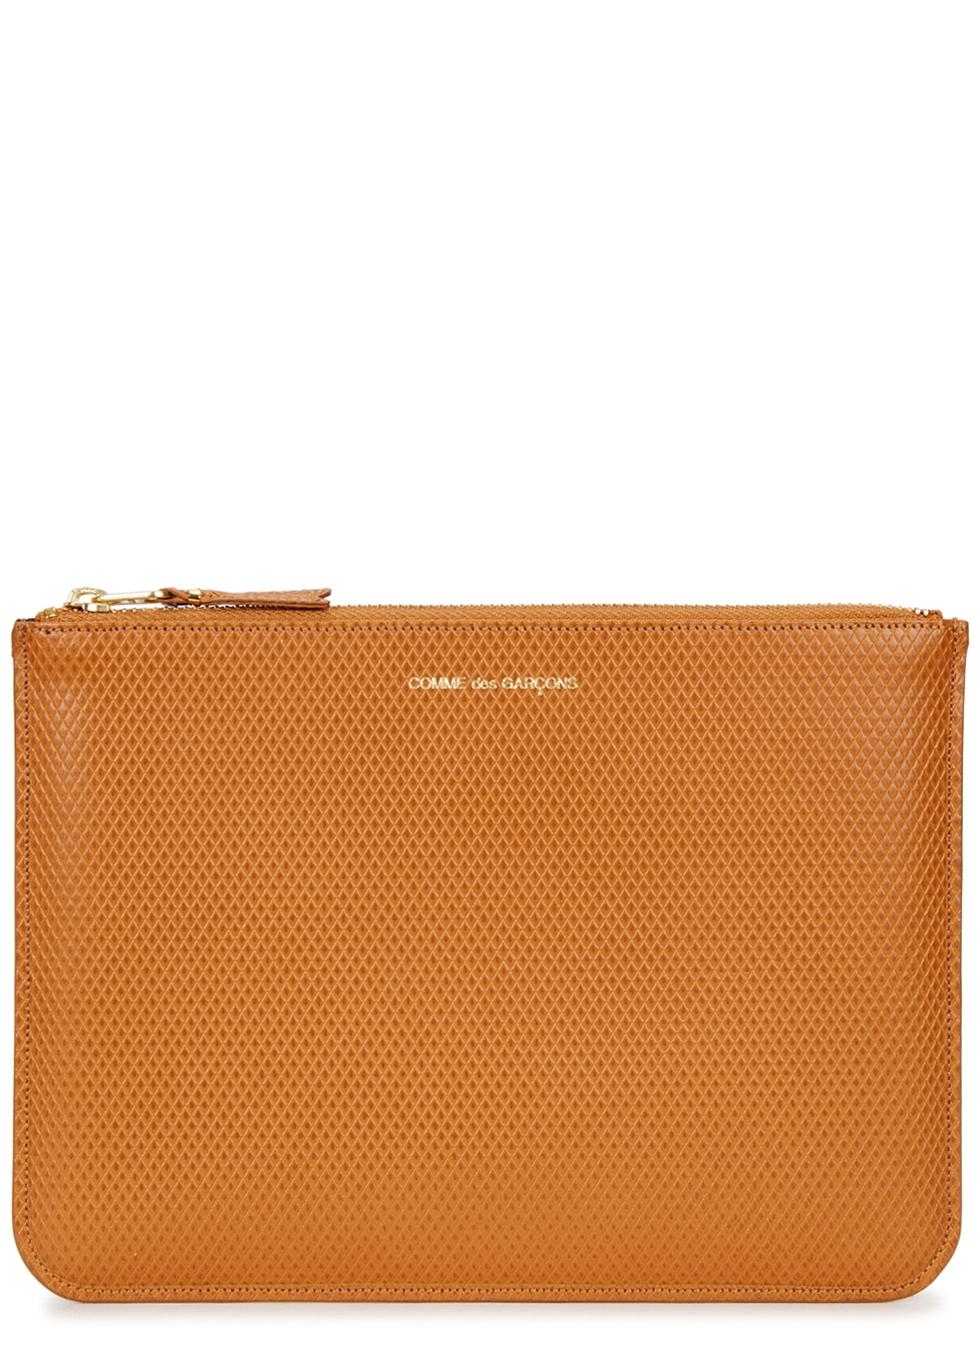 Caramel embossed leather pouch - Comme des Garçons